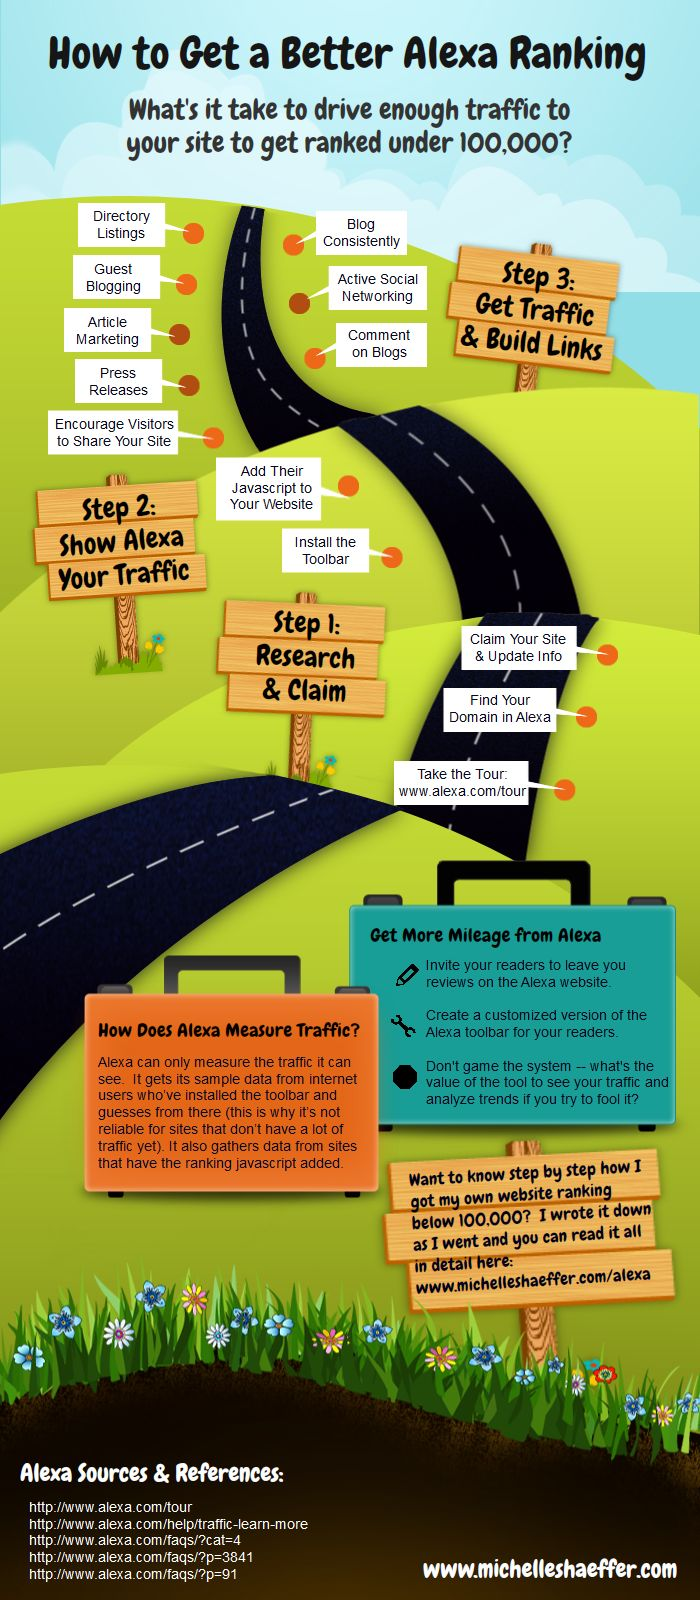 How to get a better Alexa ranking #infographic #RT #Websitedesign